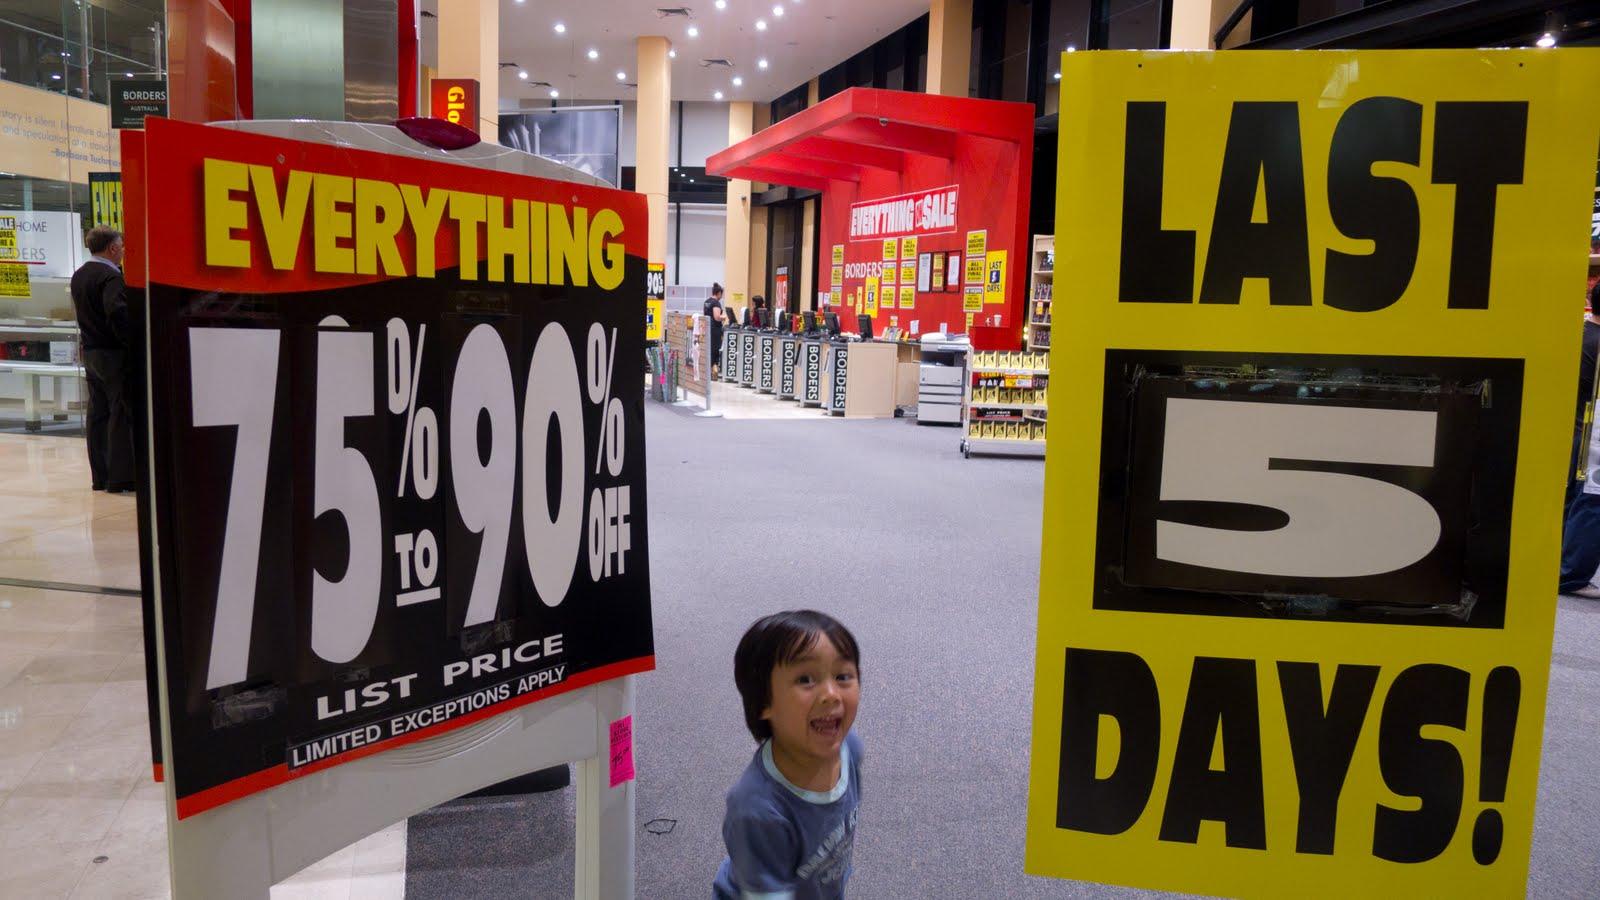 Diariesofabeautifullady borders parramatta closing down sale 90 off